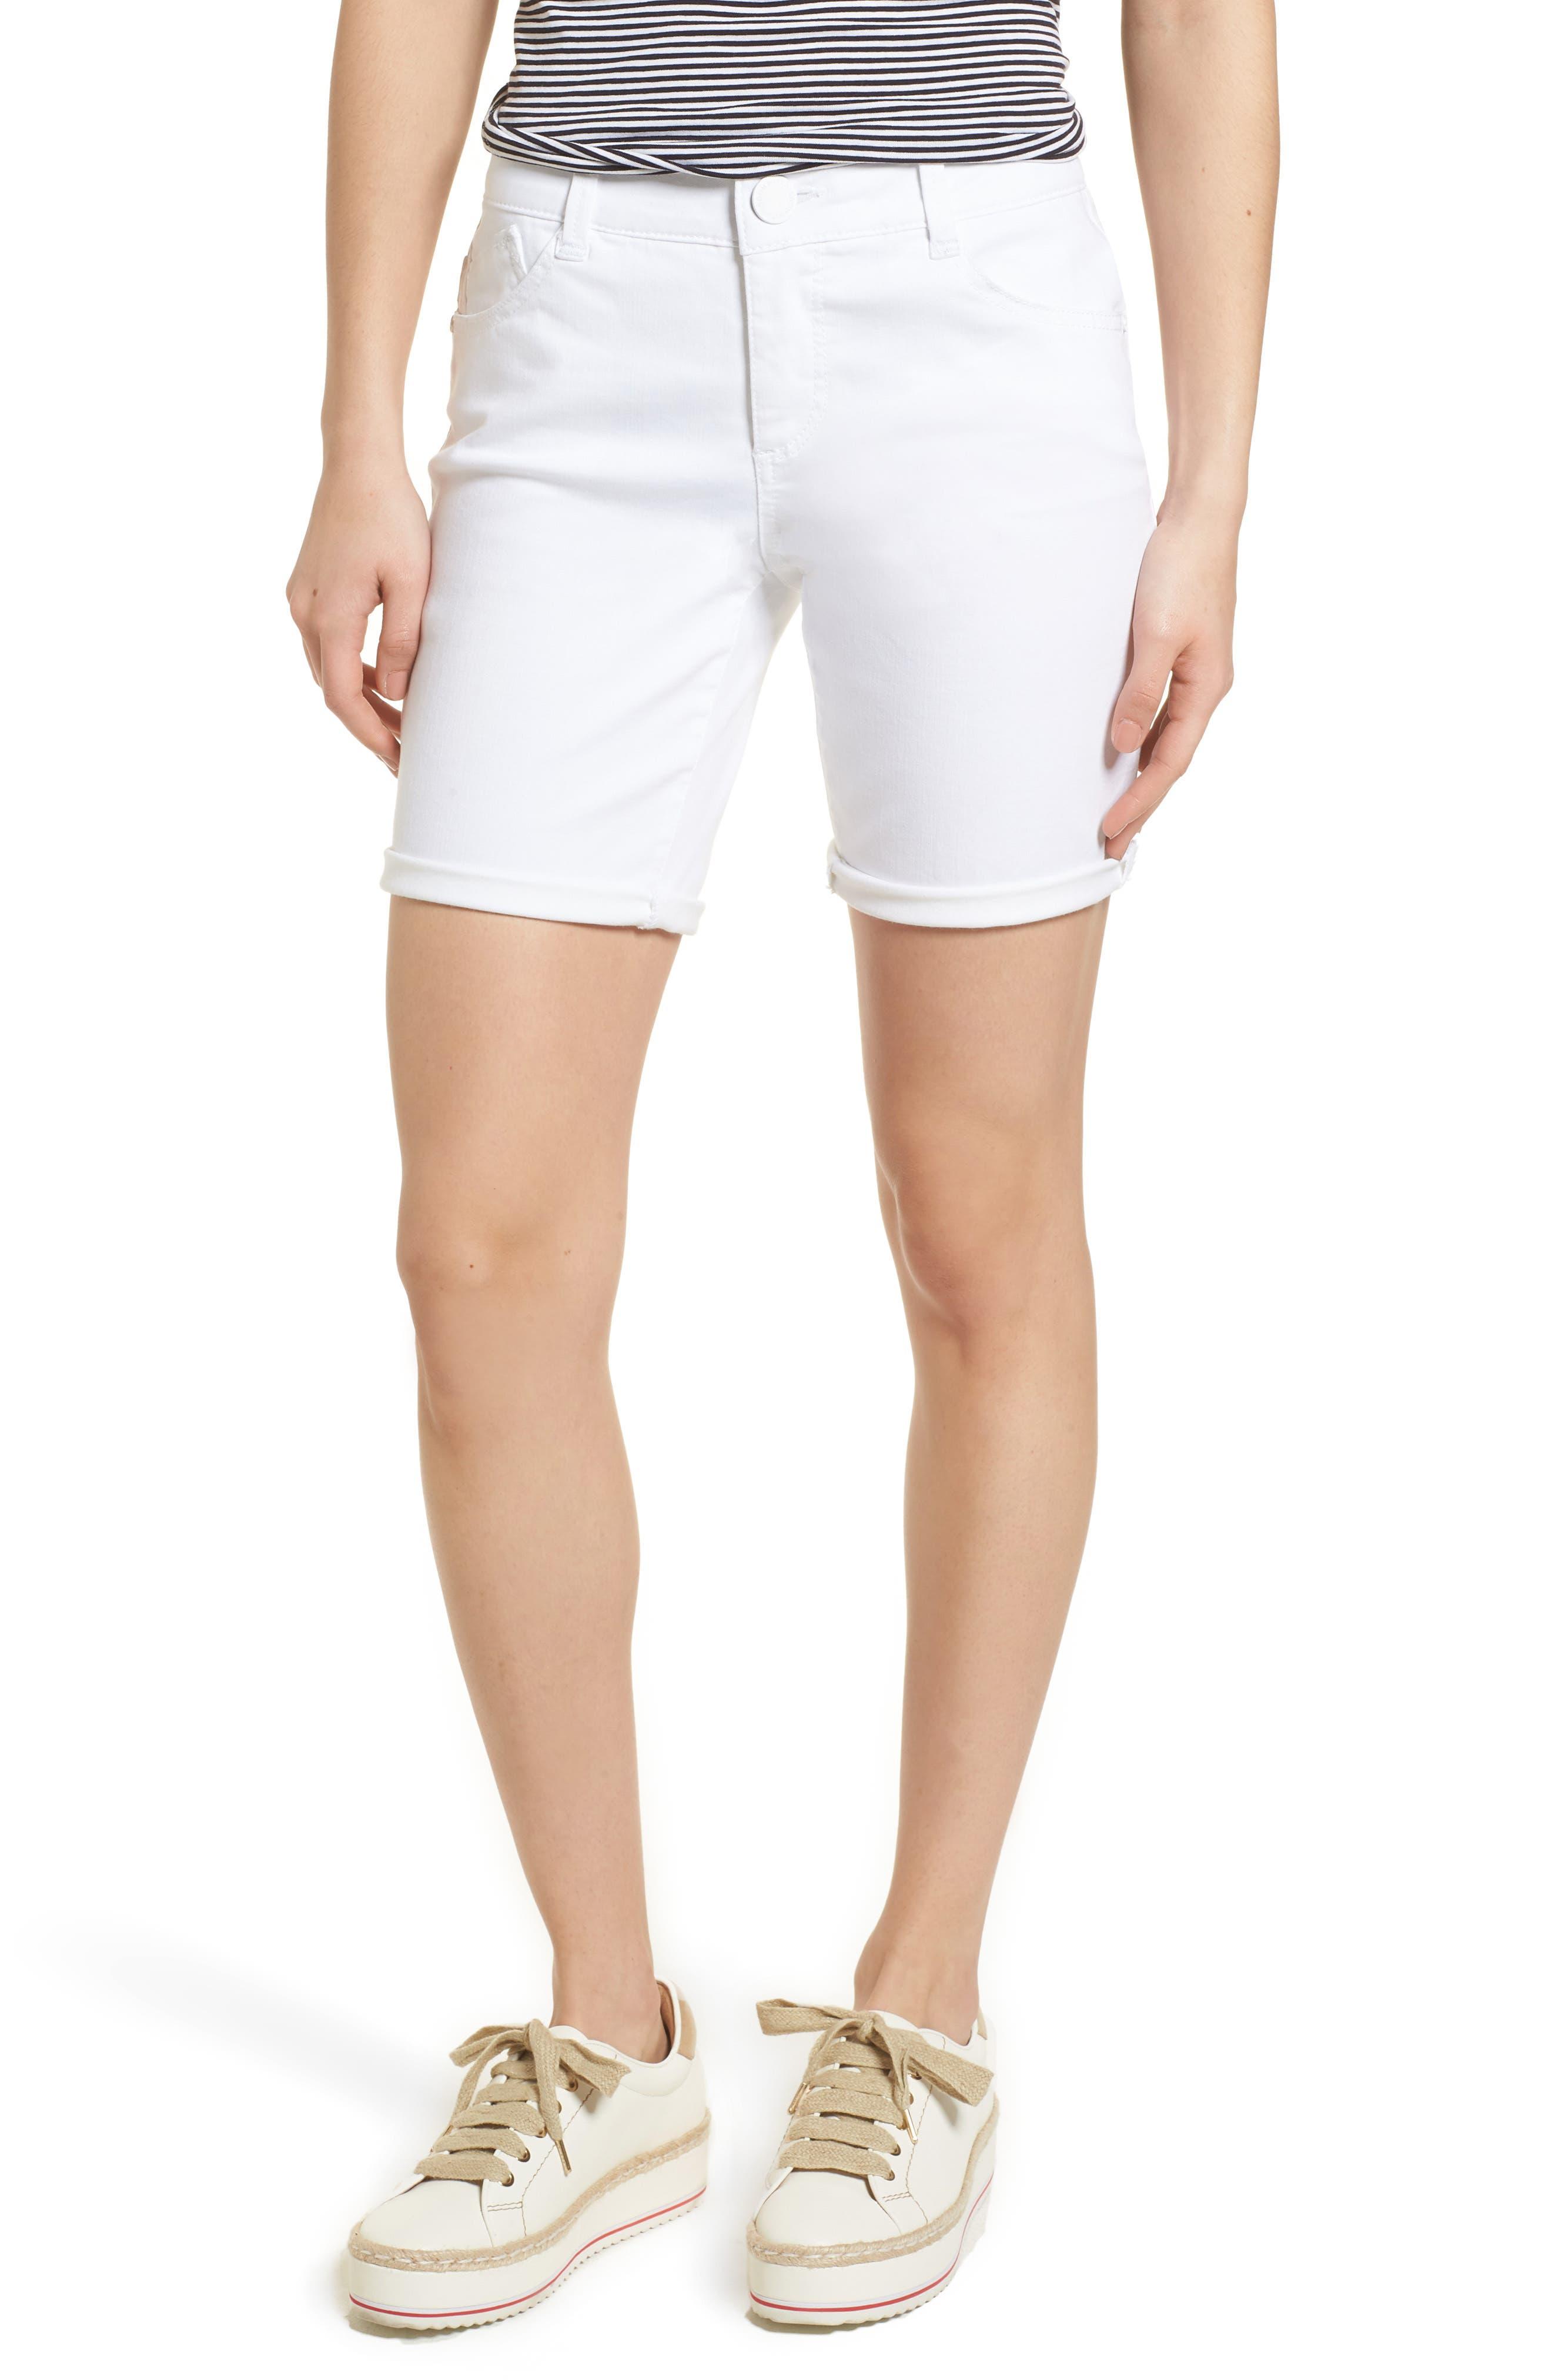 WIT & WISDOM, Ab-Solution White Denim Shorts, Main thumbnail 1, color, OPTIC WHITE